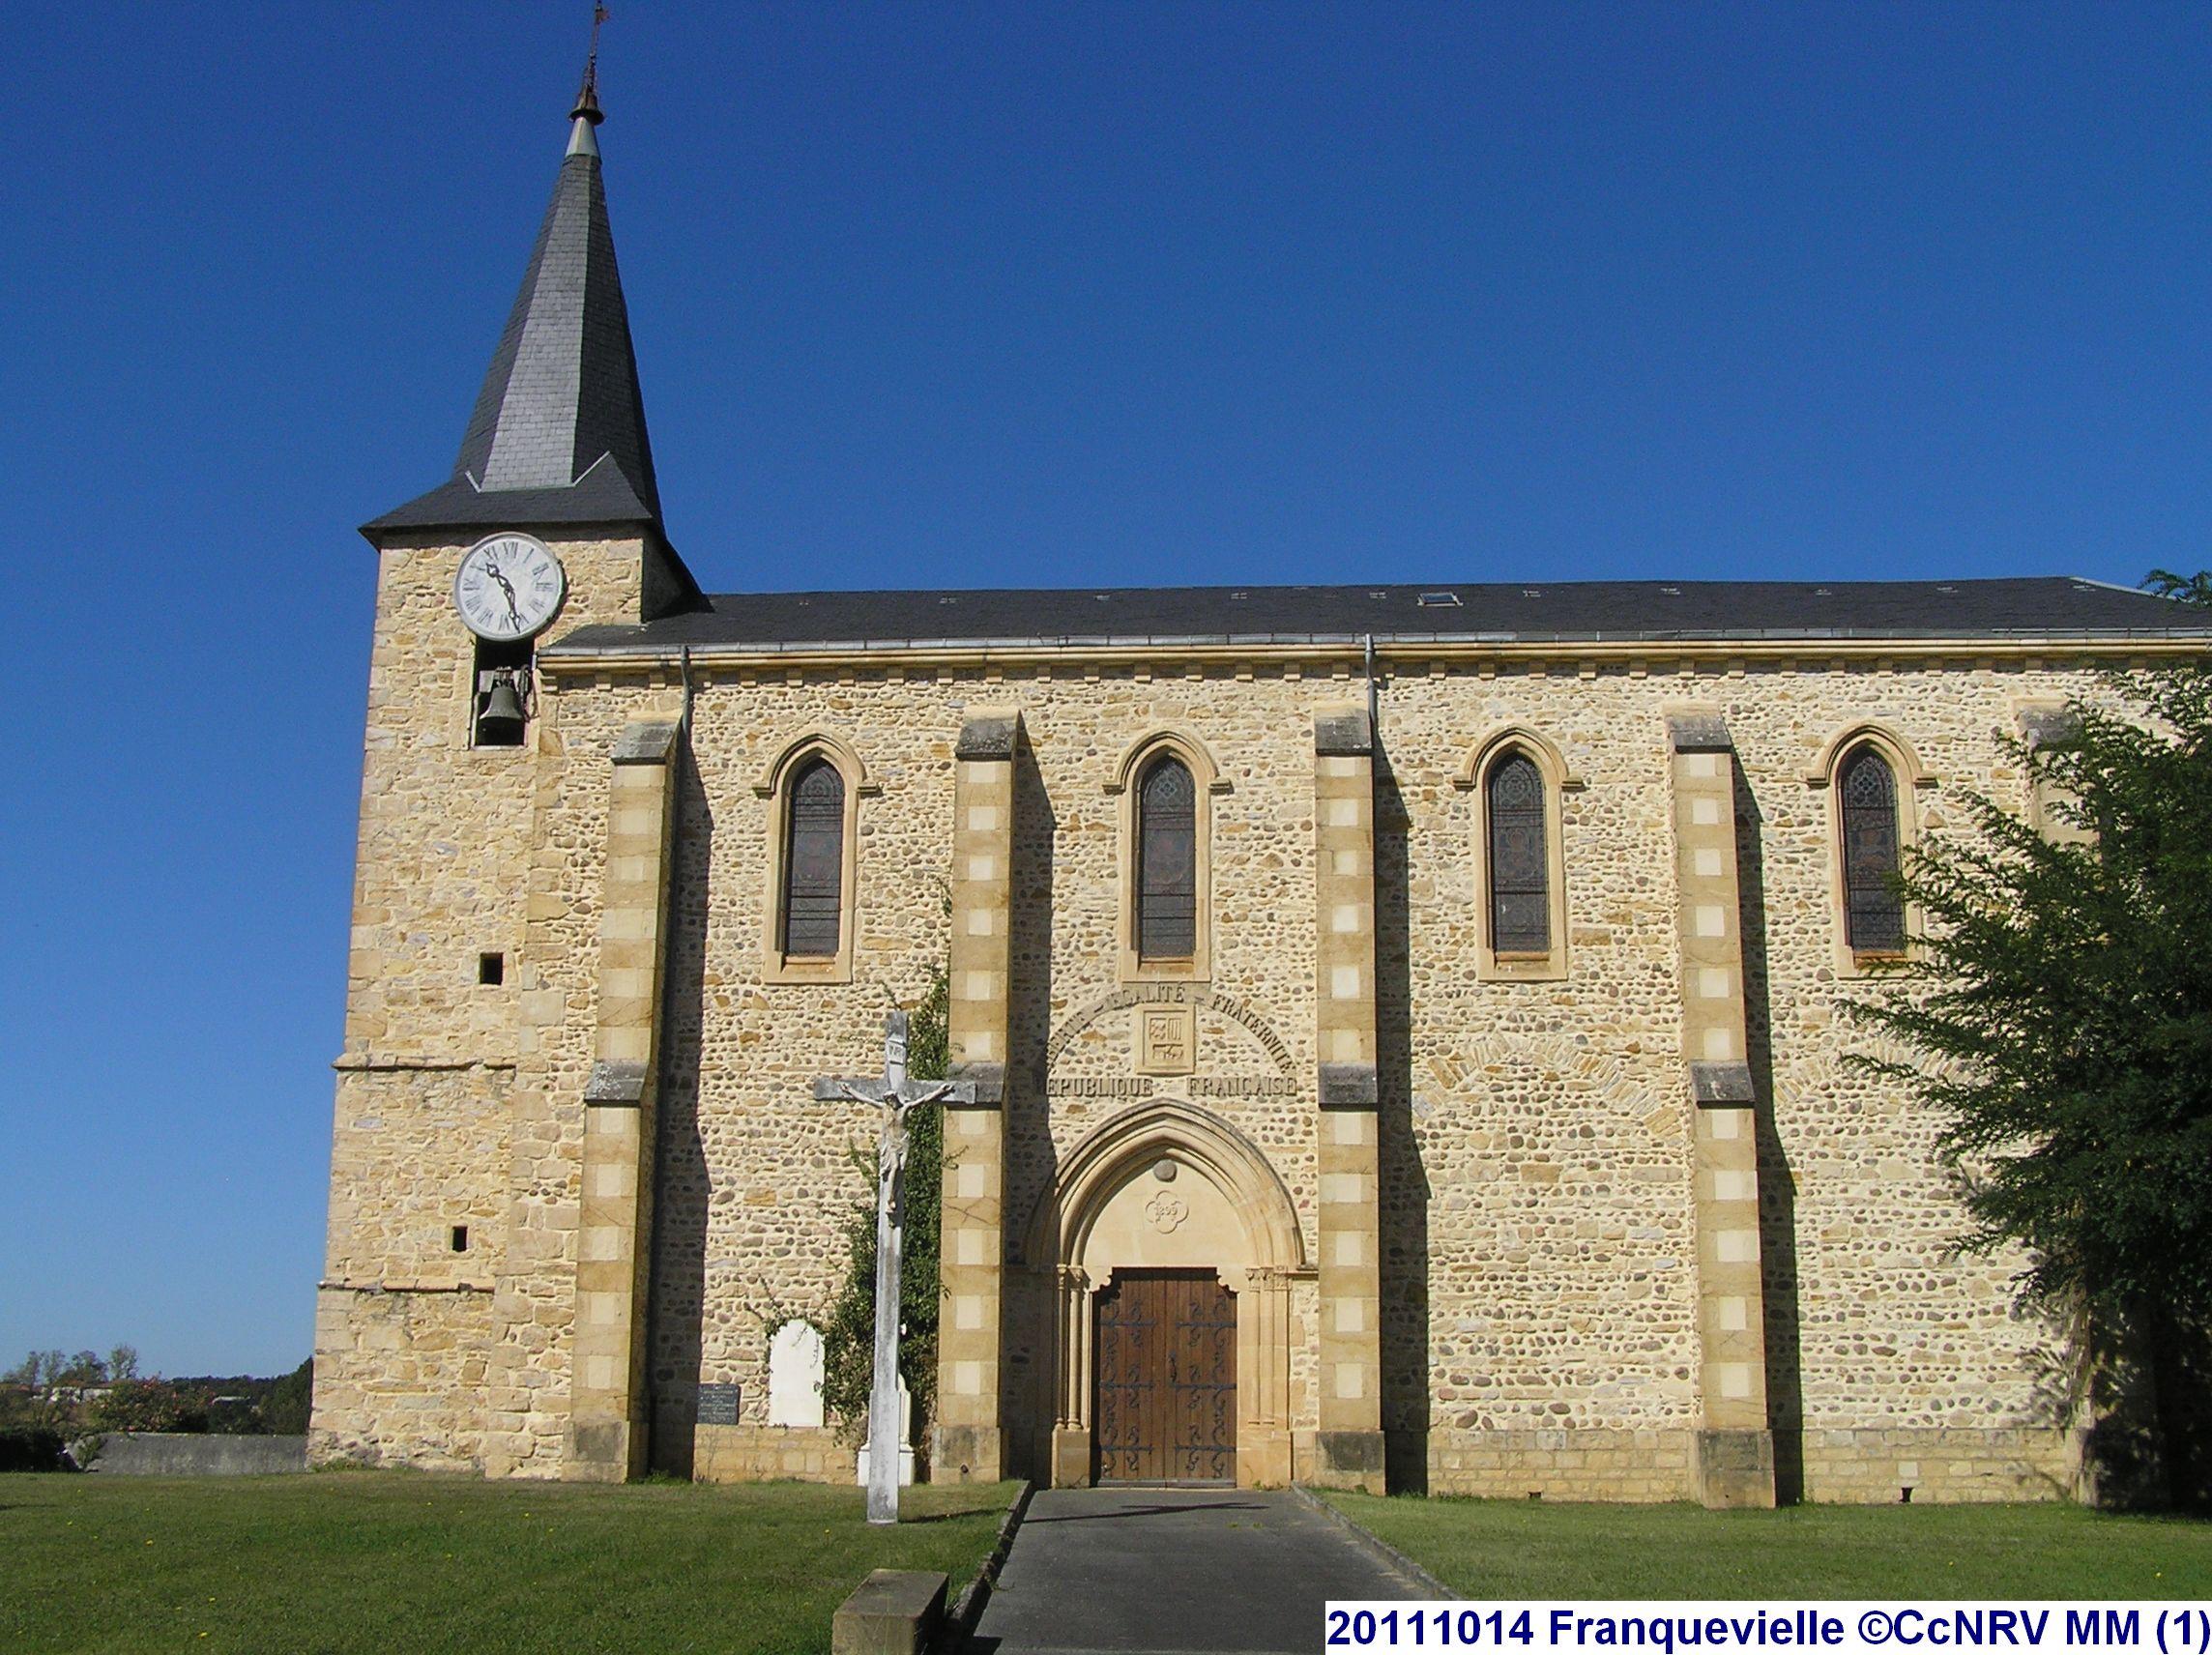 THE CHURCH'S PEDIMENT